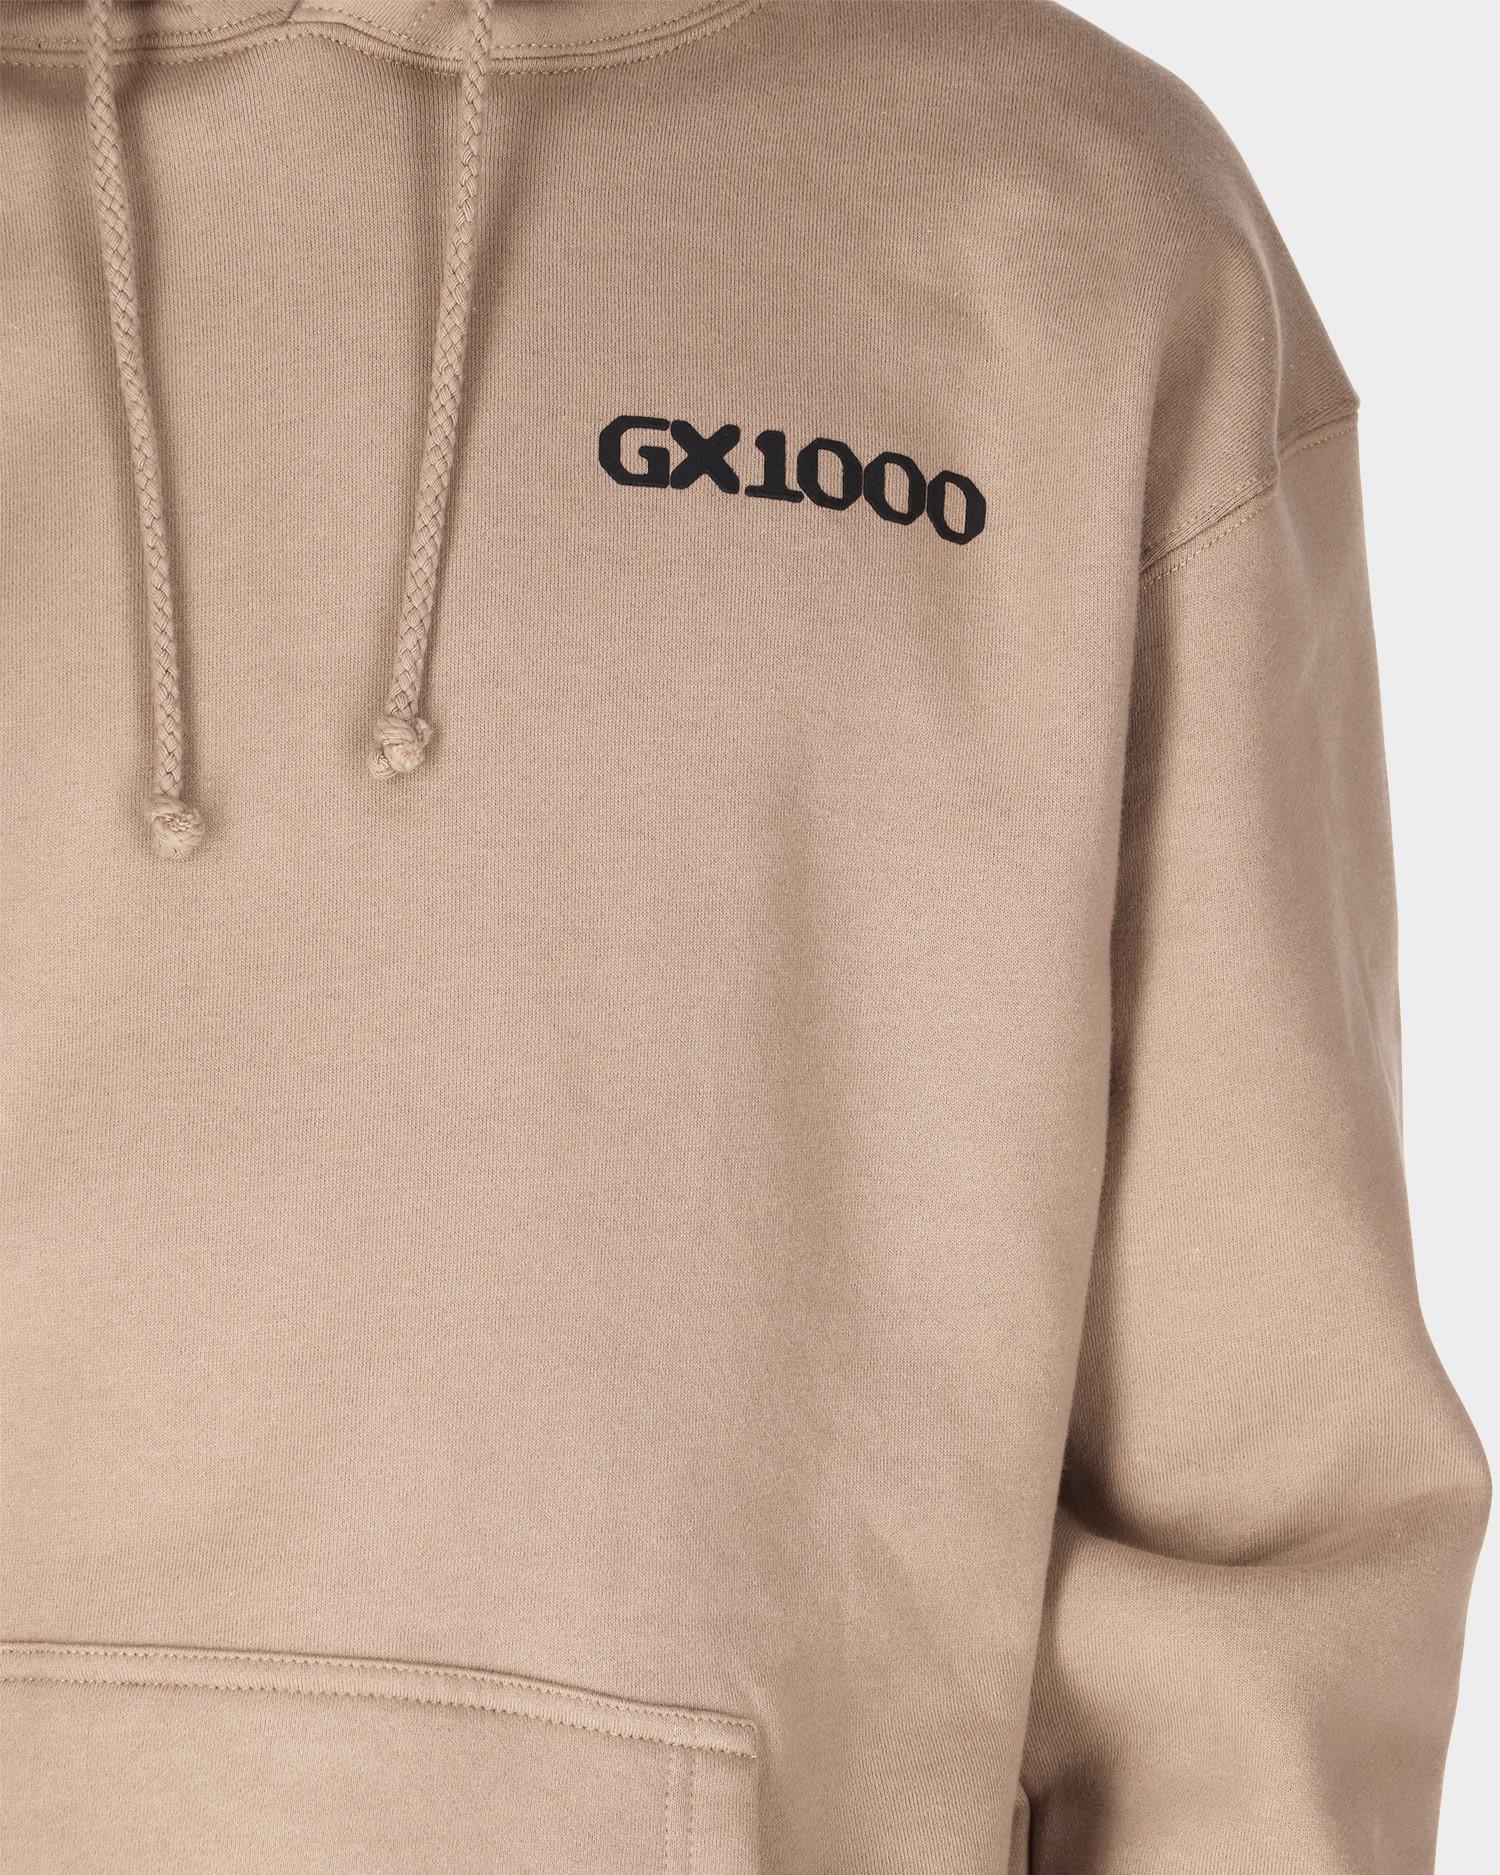 GX 1000 Bipolar Sanstone Hoodie